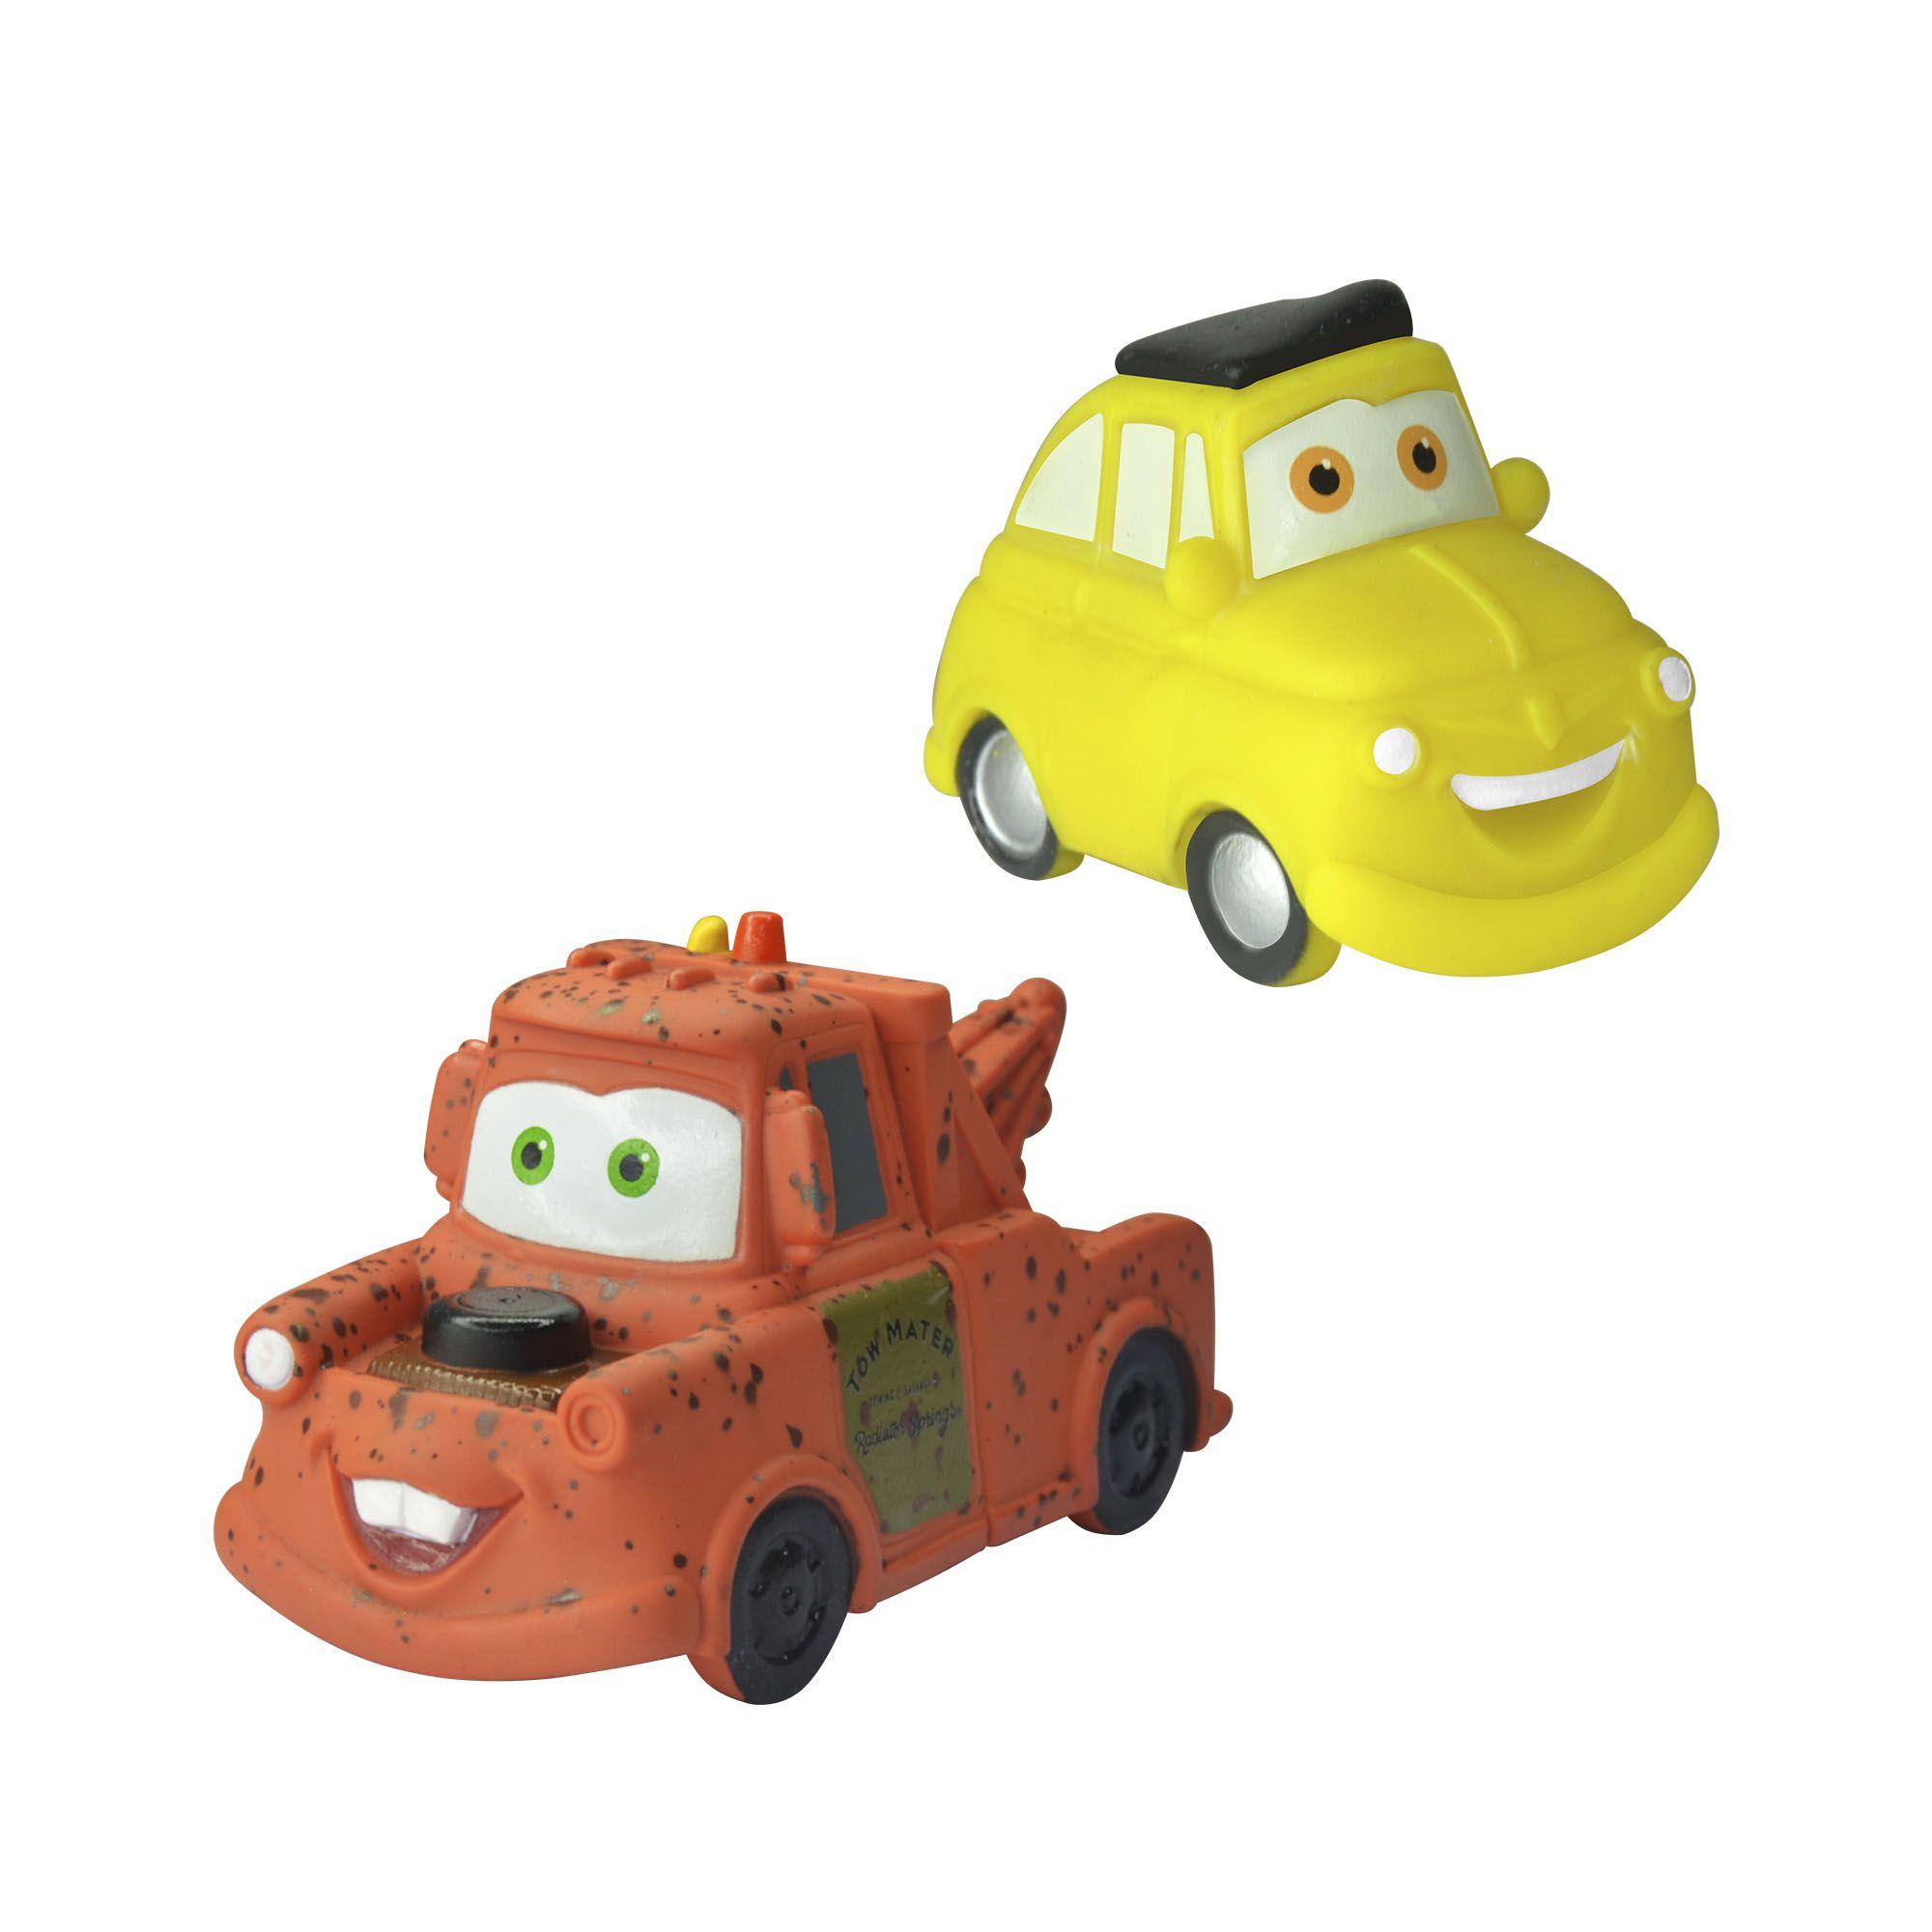 Coleção Mini Vinil Carros Luige e Tow Matter